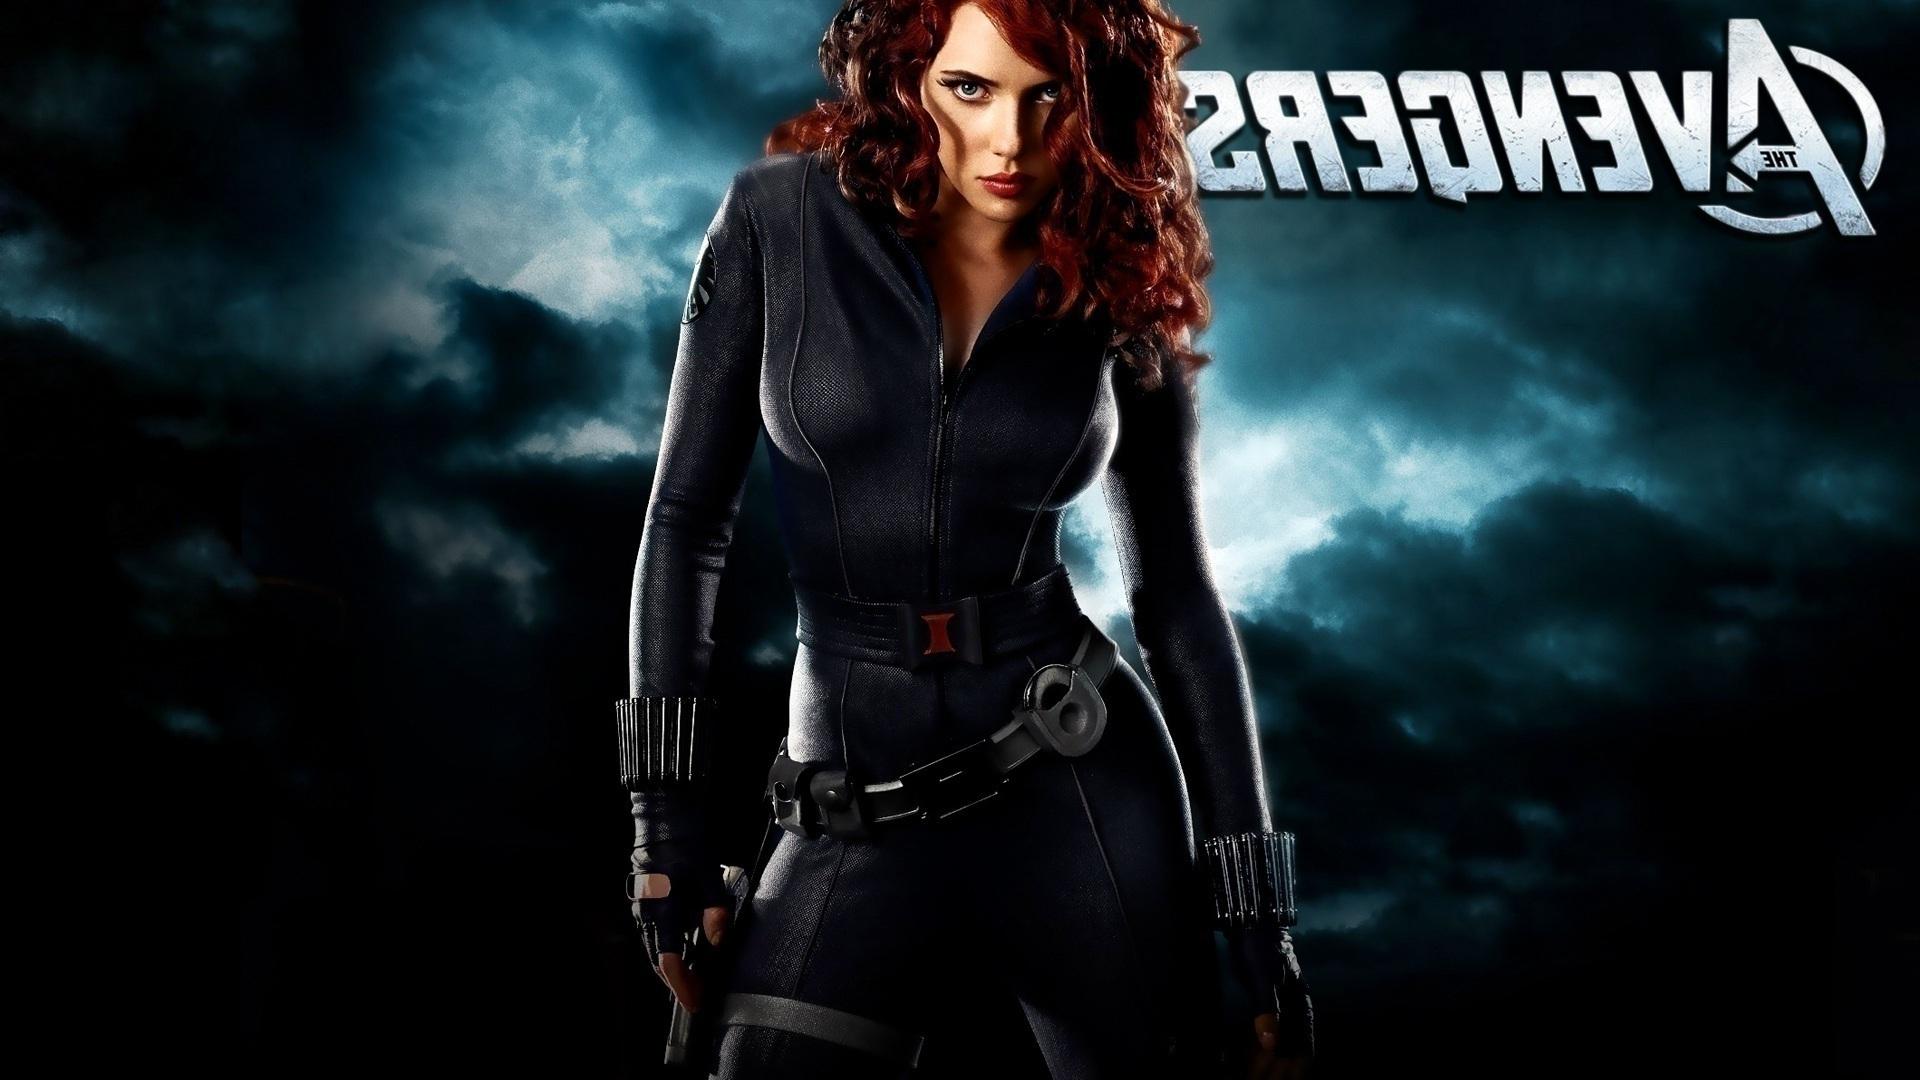 The Avengers Black Widow Widescreen Hd Wallpaper Scarlett Johansson Black Widow Wallpaper Hd 56910 Hd Wallpaper Backgrounds Download